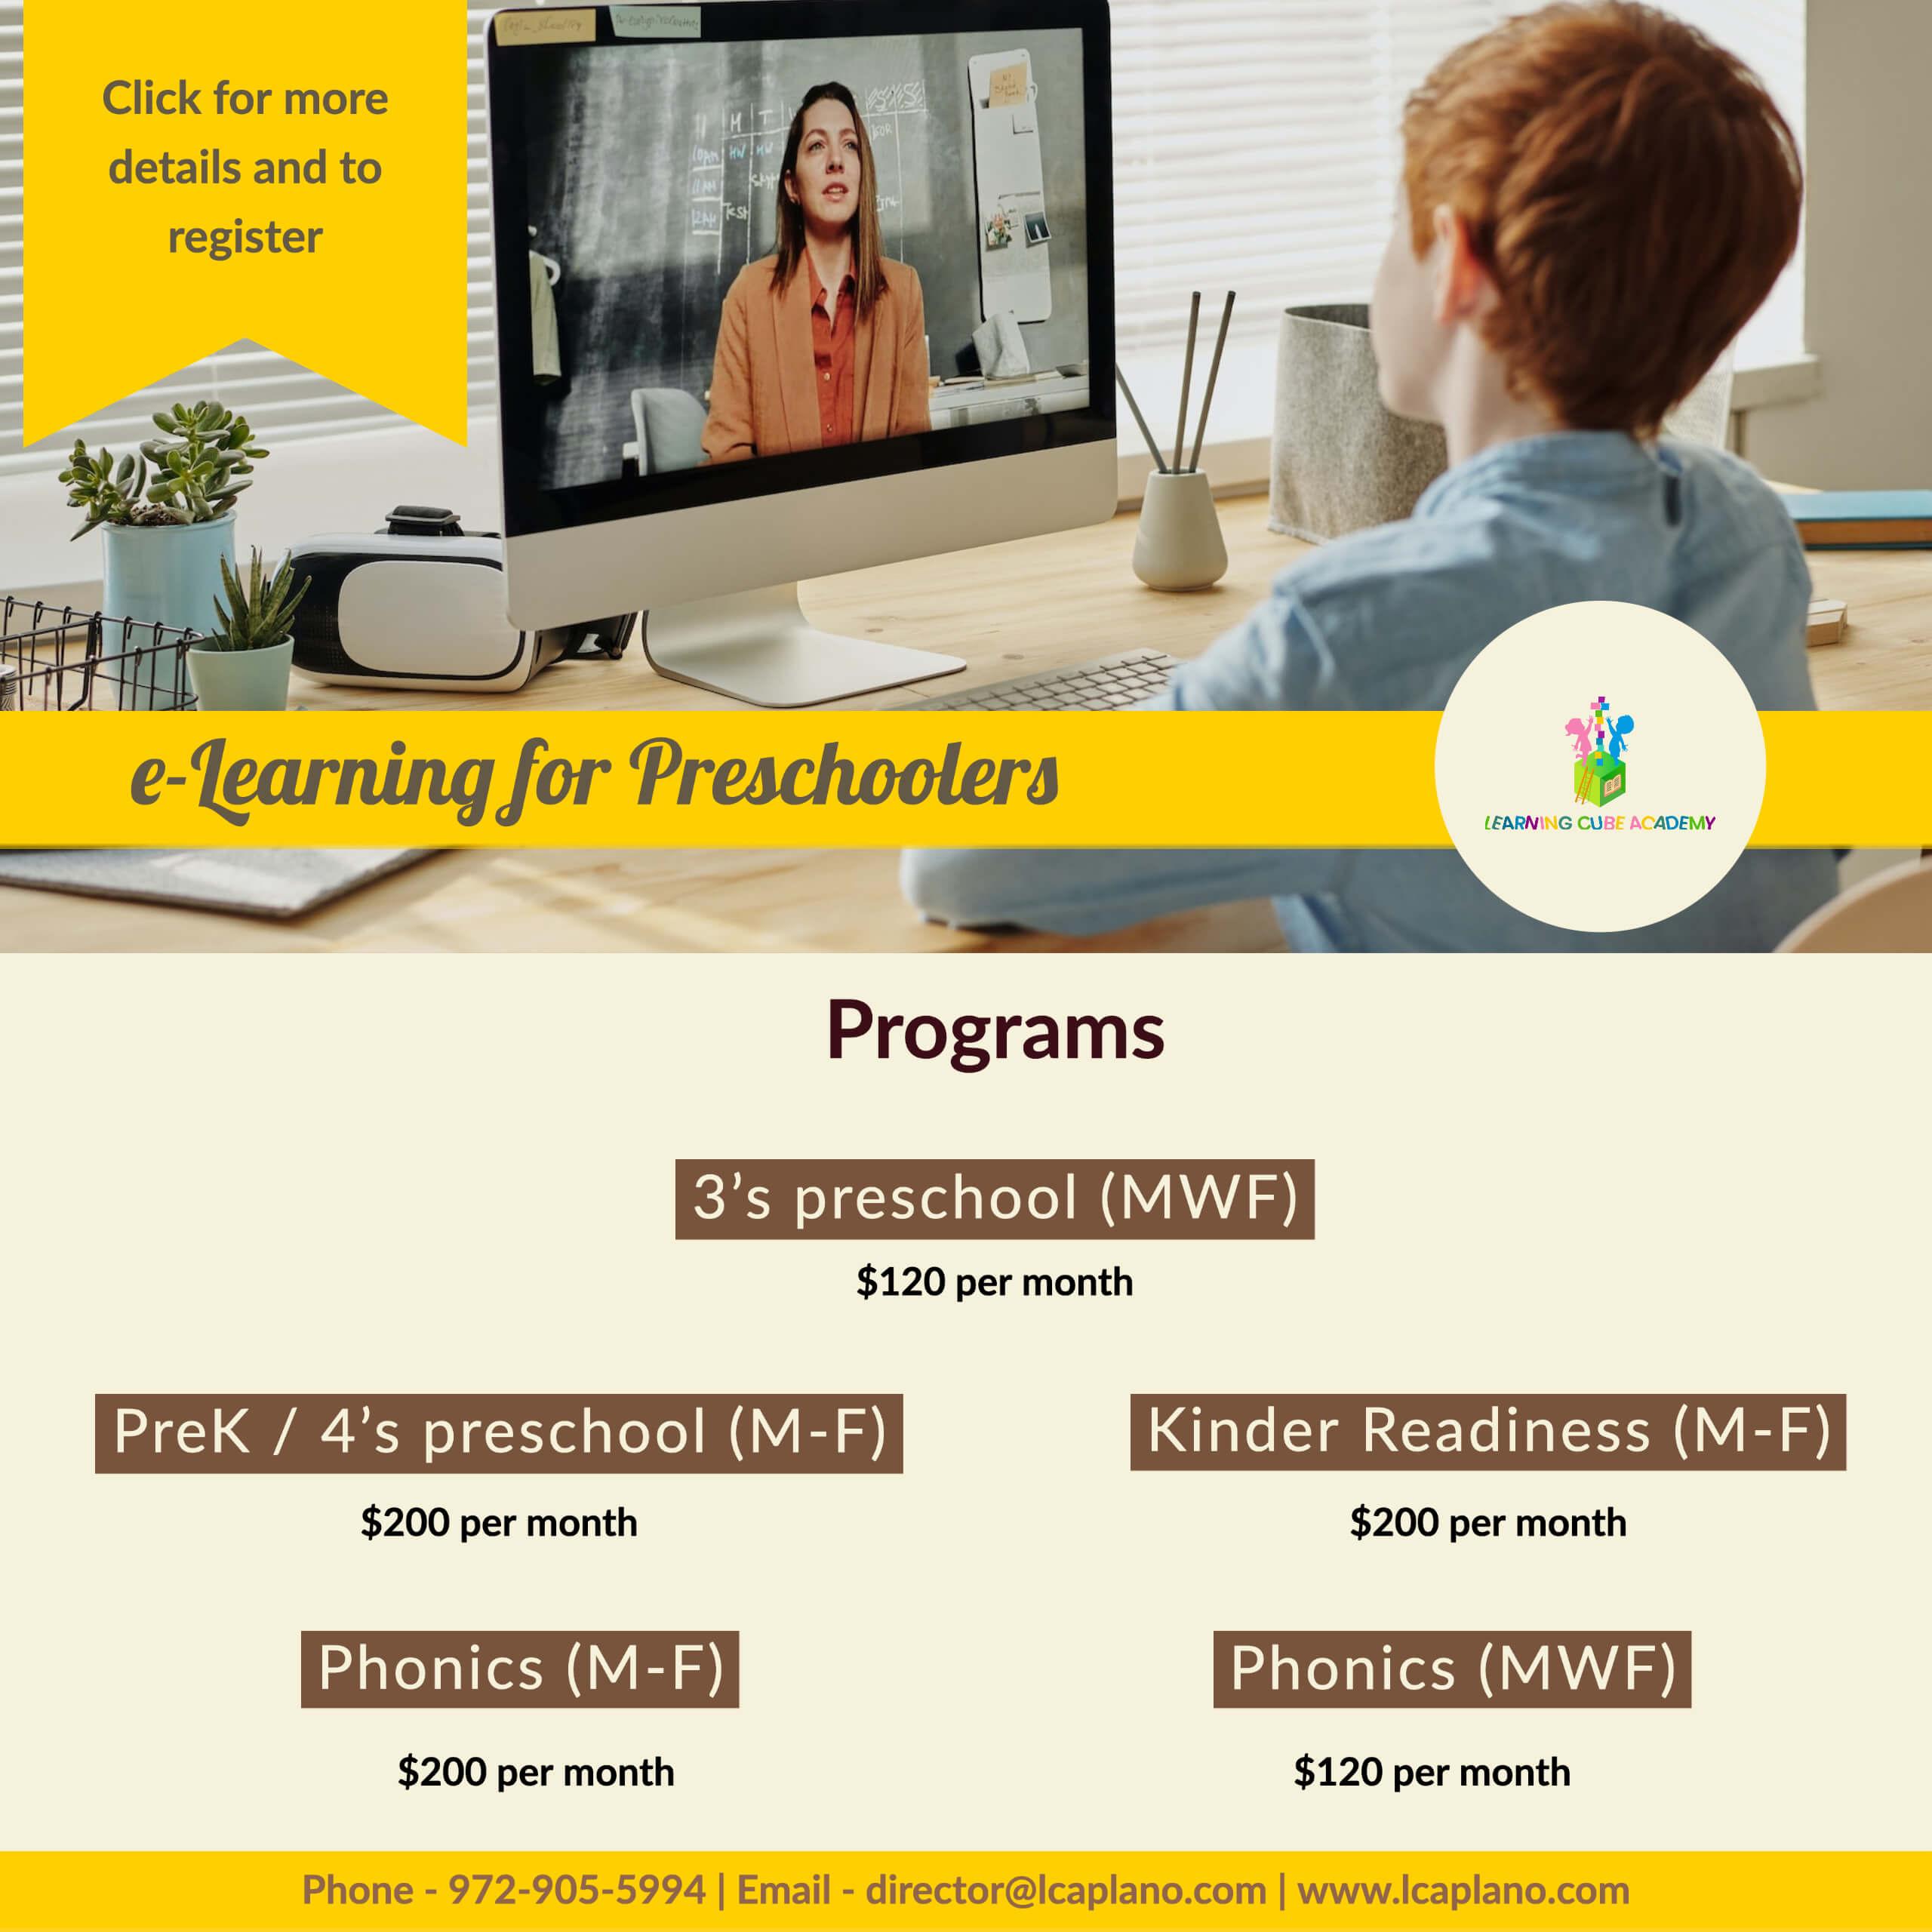 Summer Learning for Preschoolers